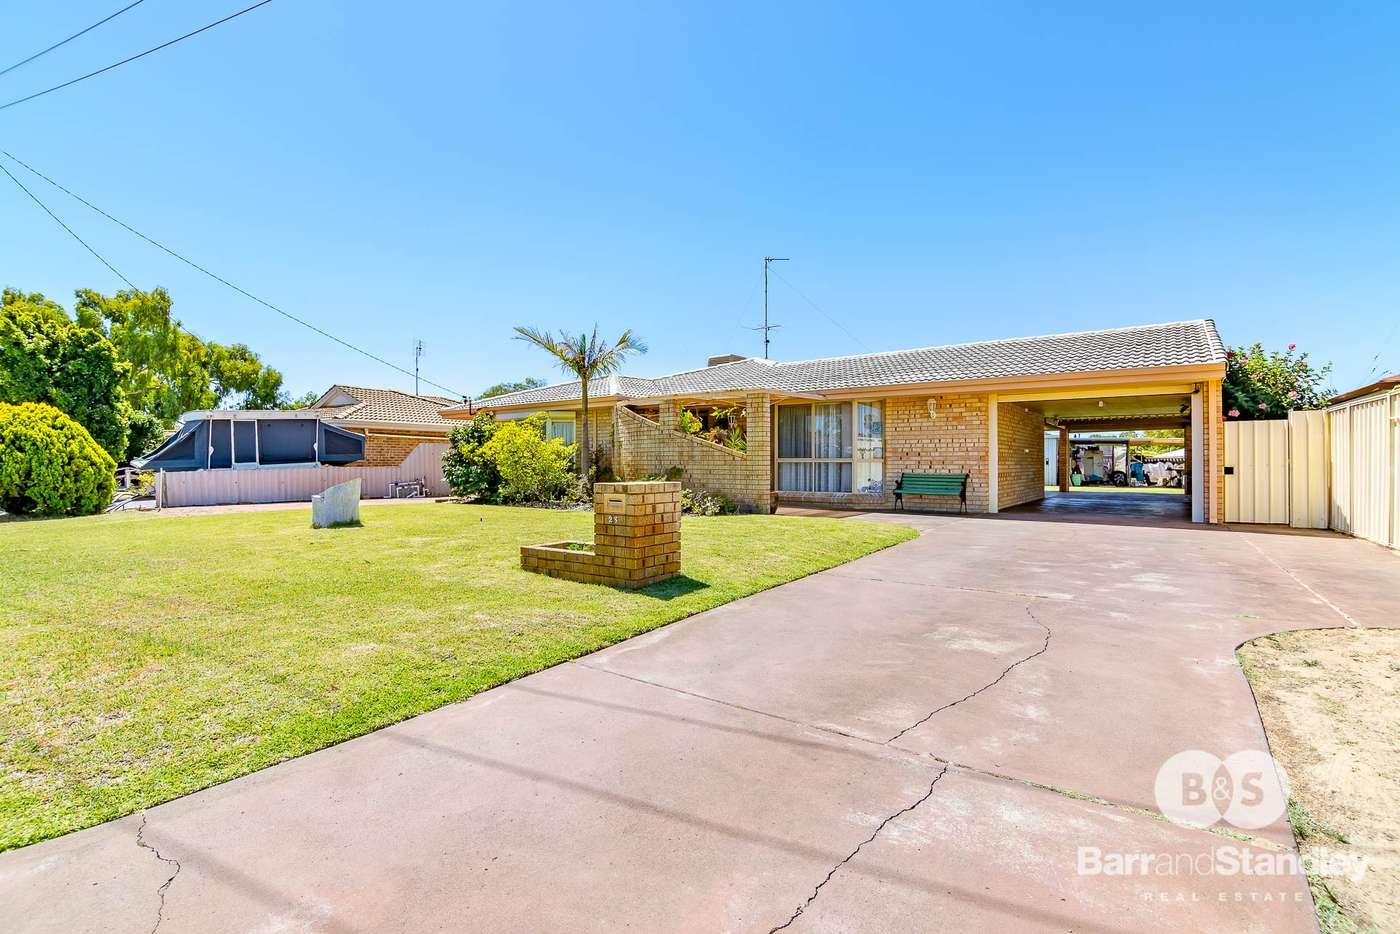 Main view of Homely house listing, 23 Payton Way, Usher WA 6230